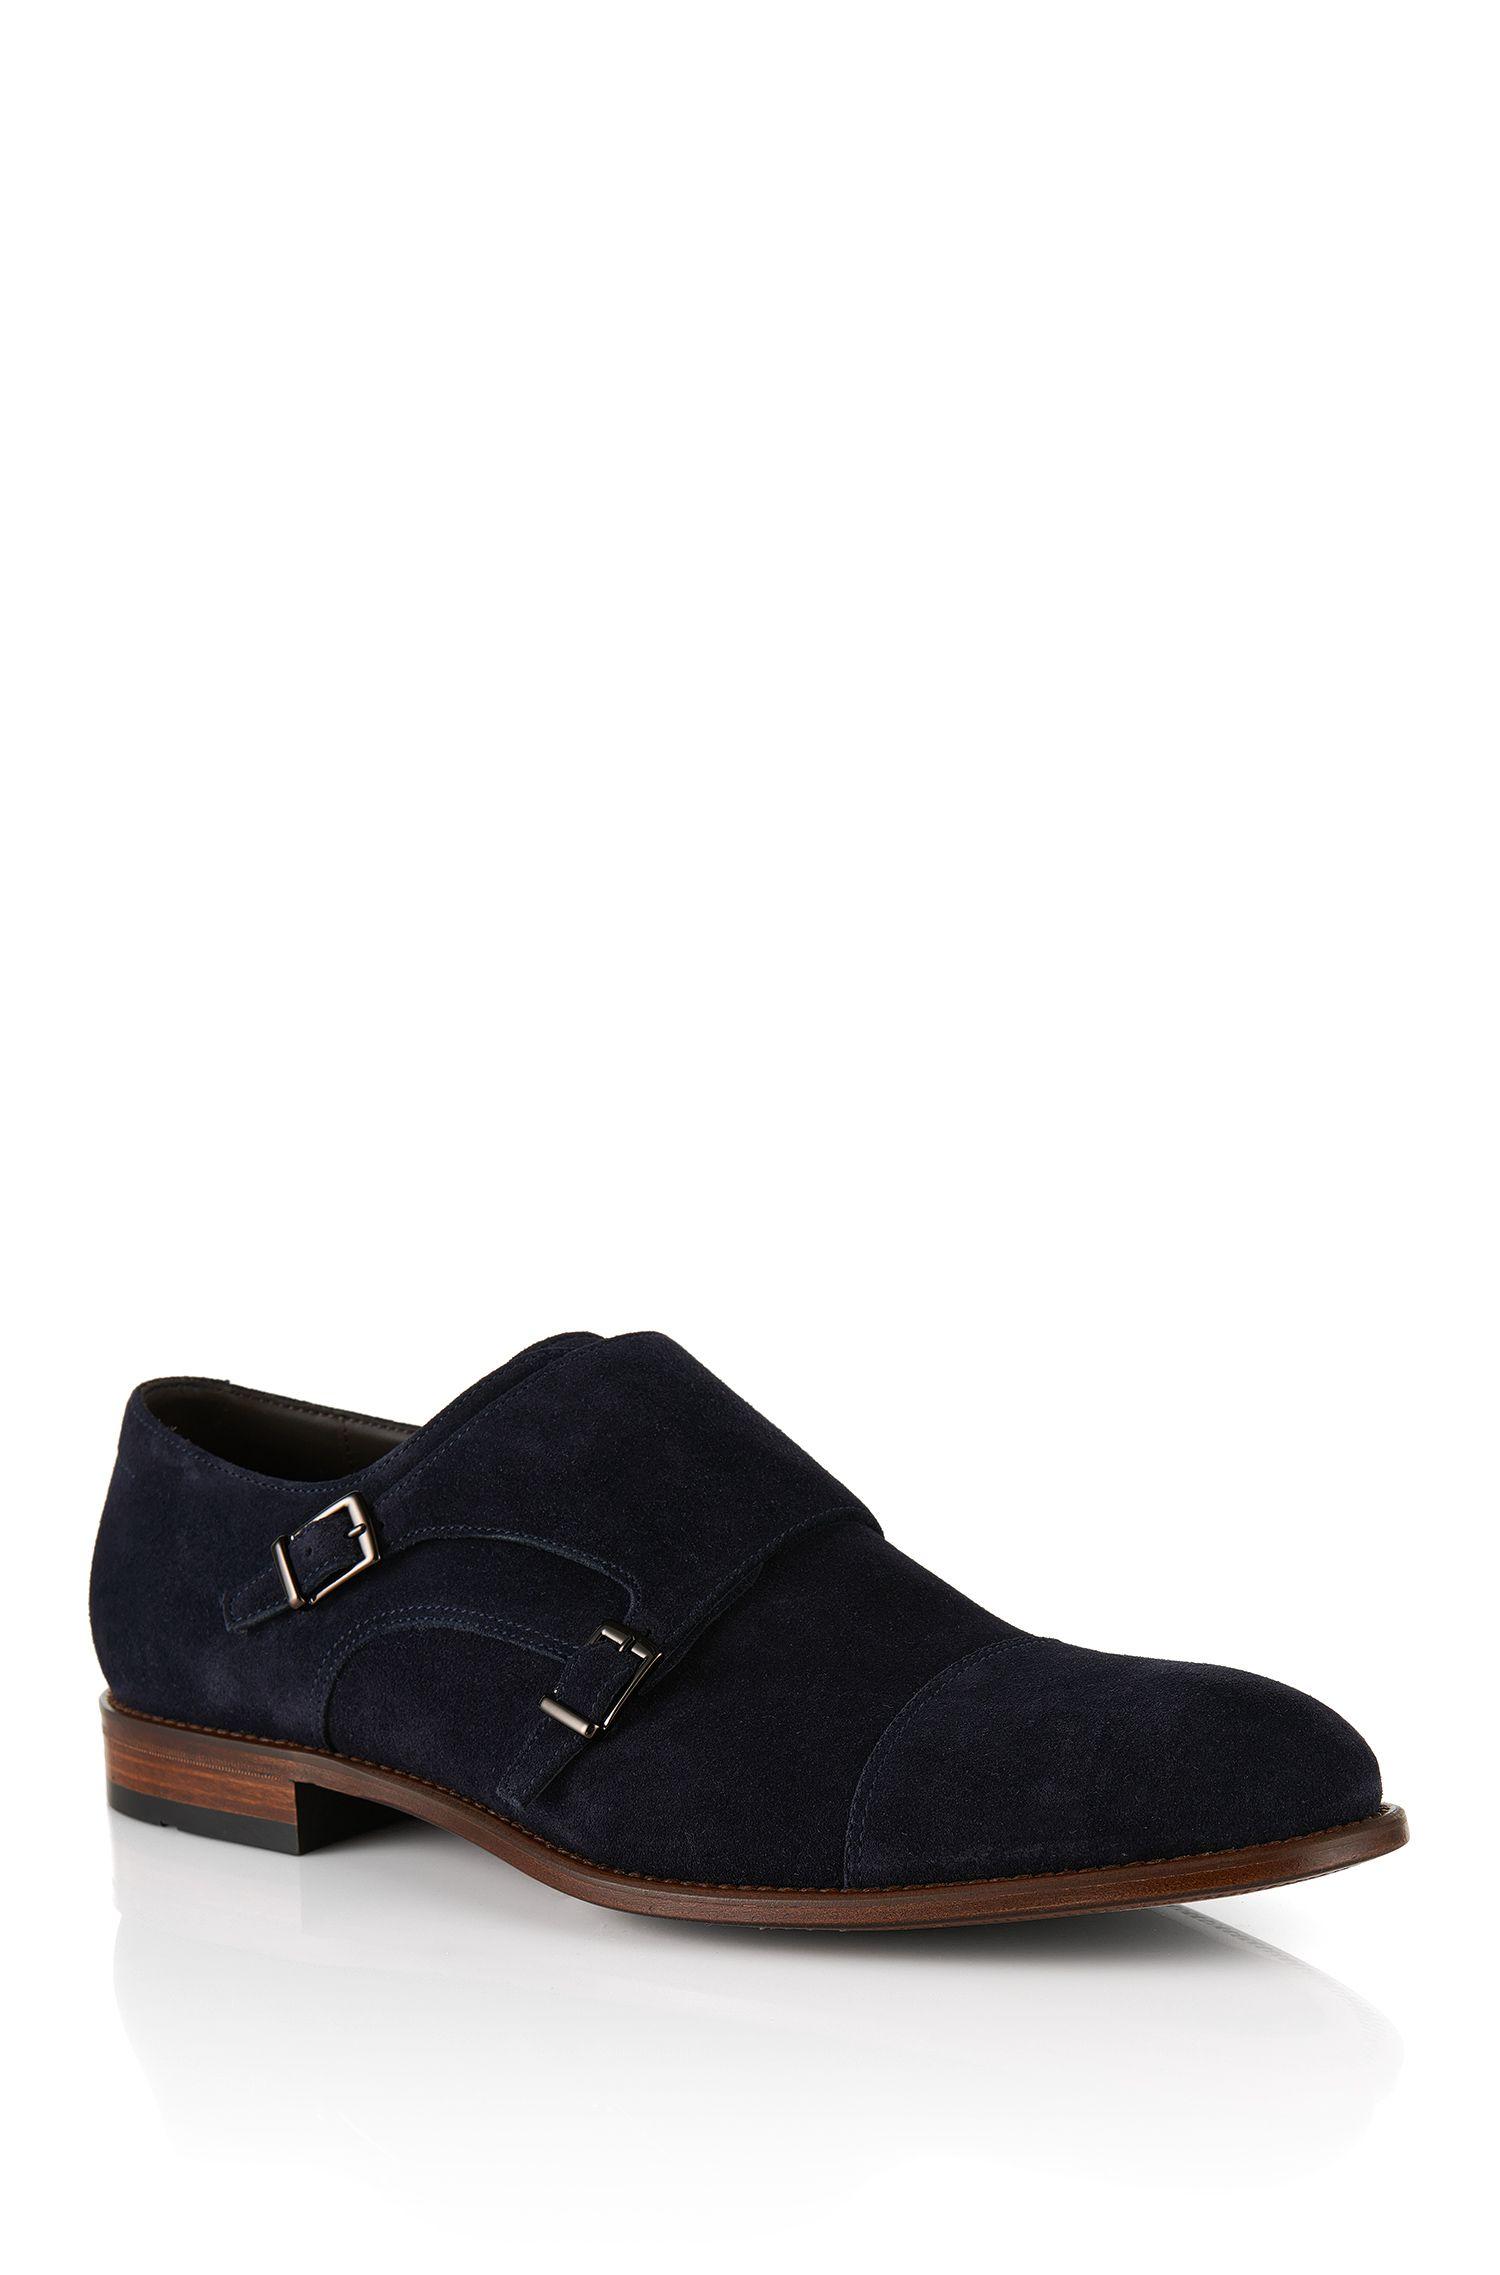 'Stomok' | Italian Suede Double Monk Strap Shoes